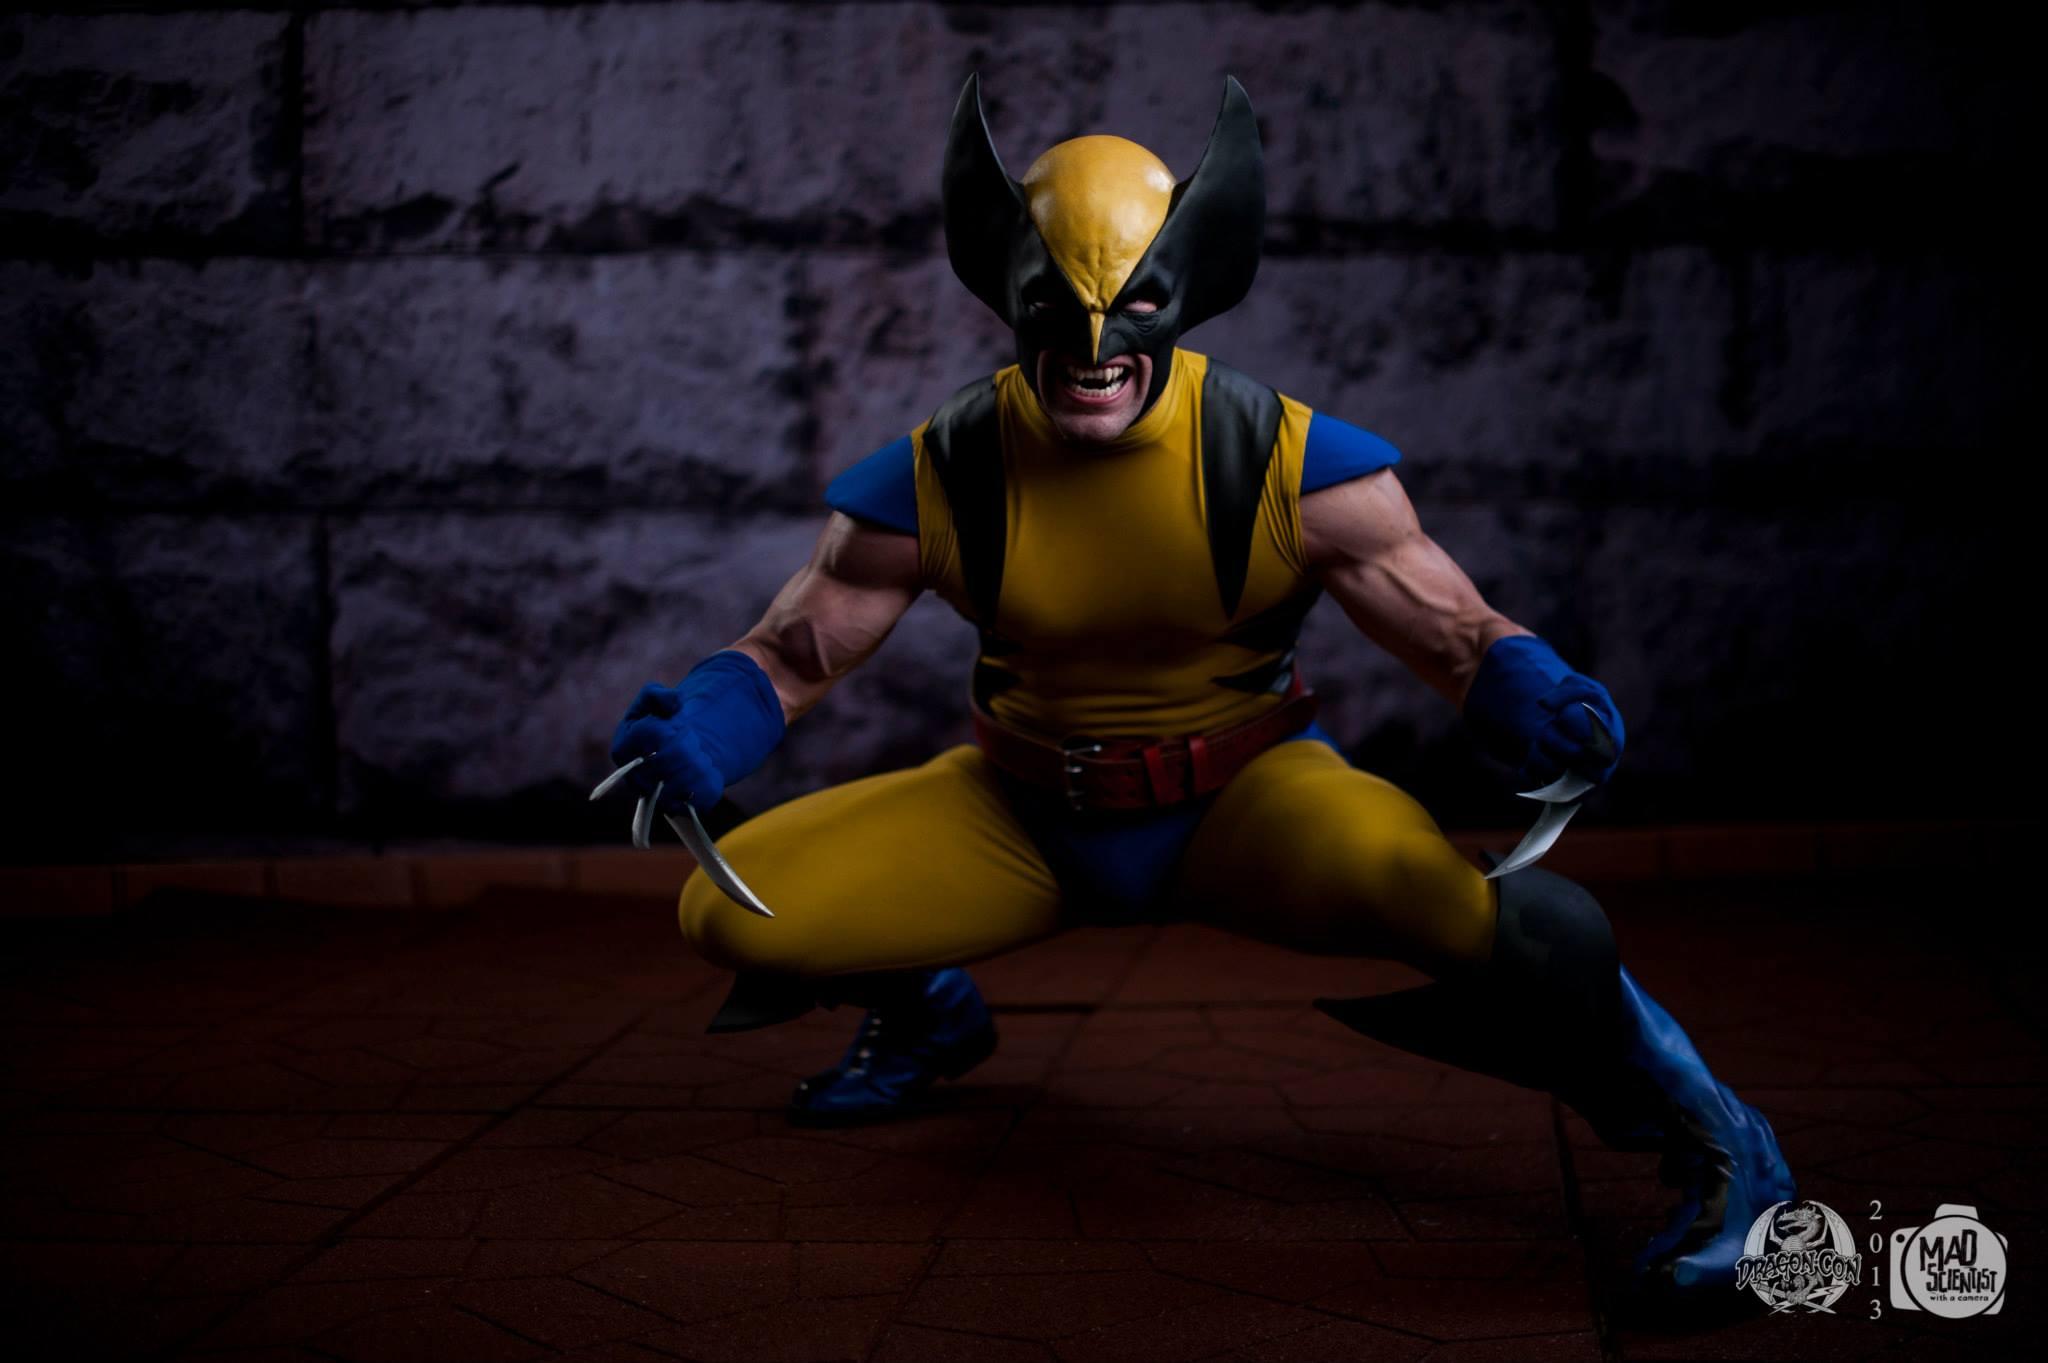 JonathanCarroll is Wolverine